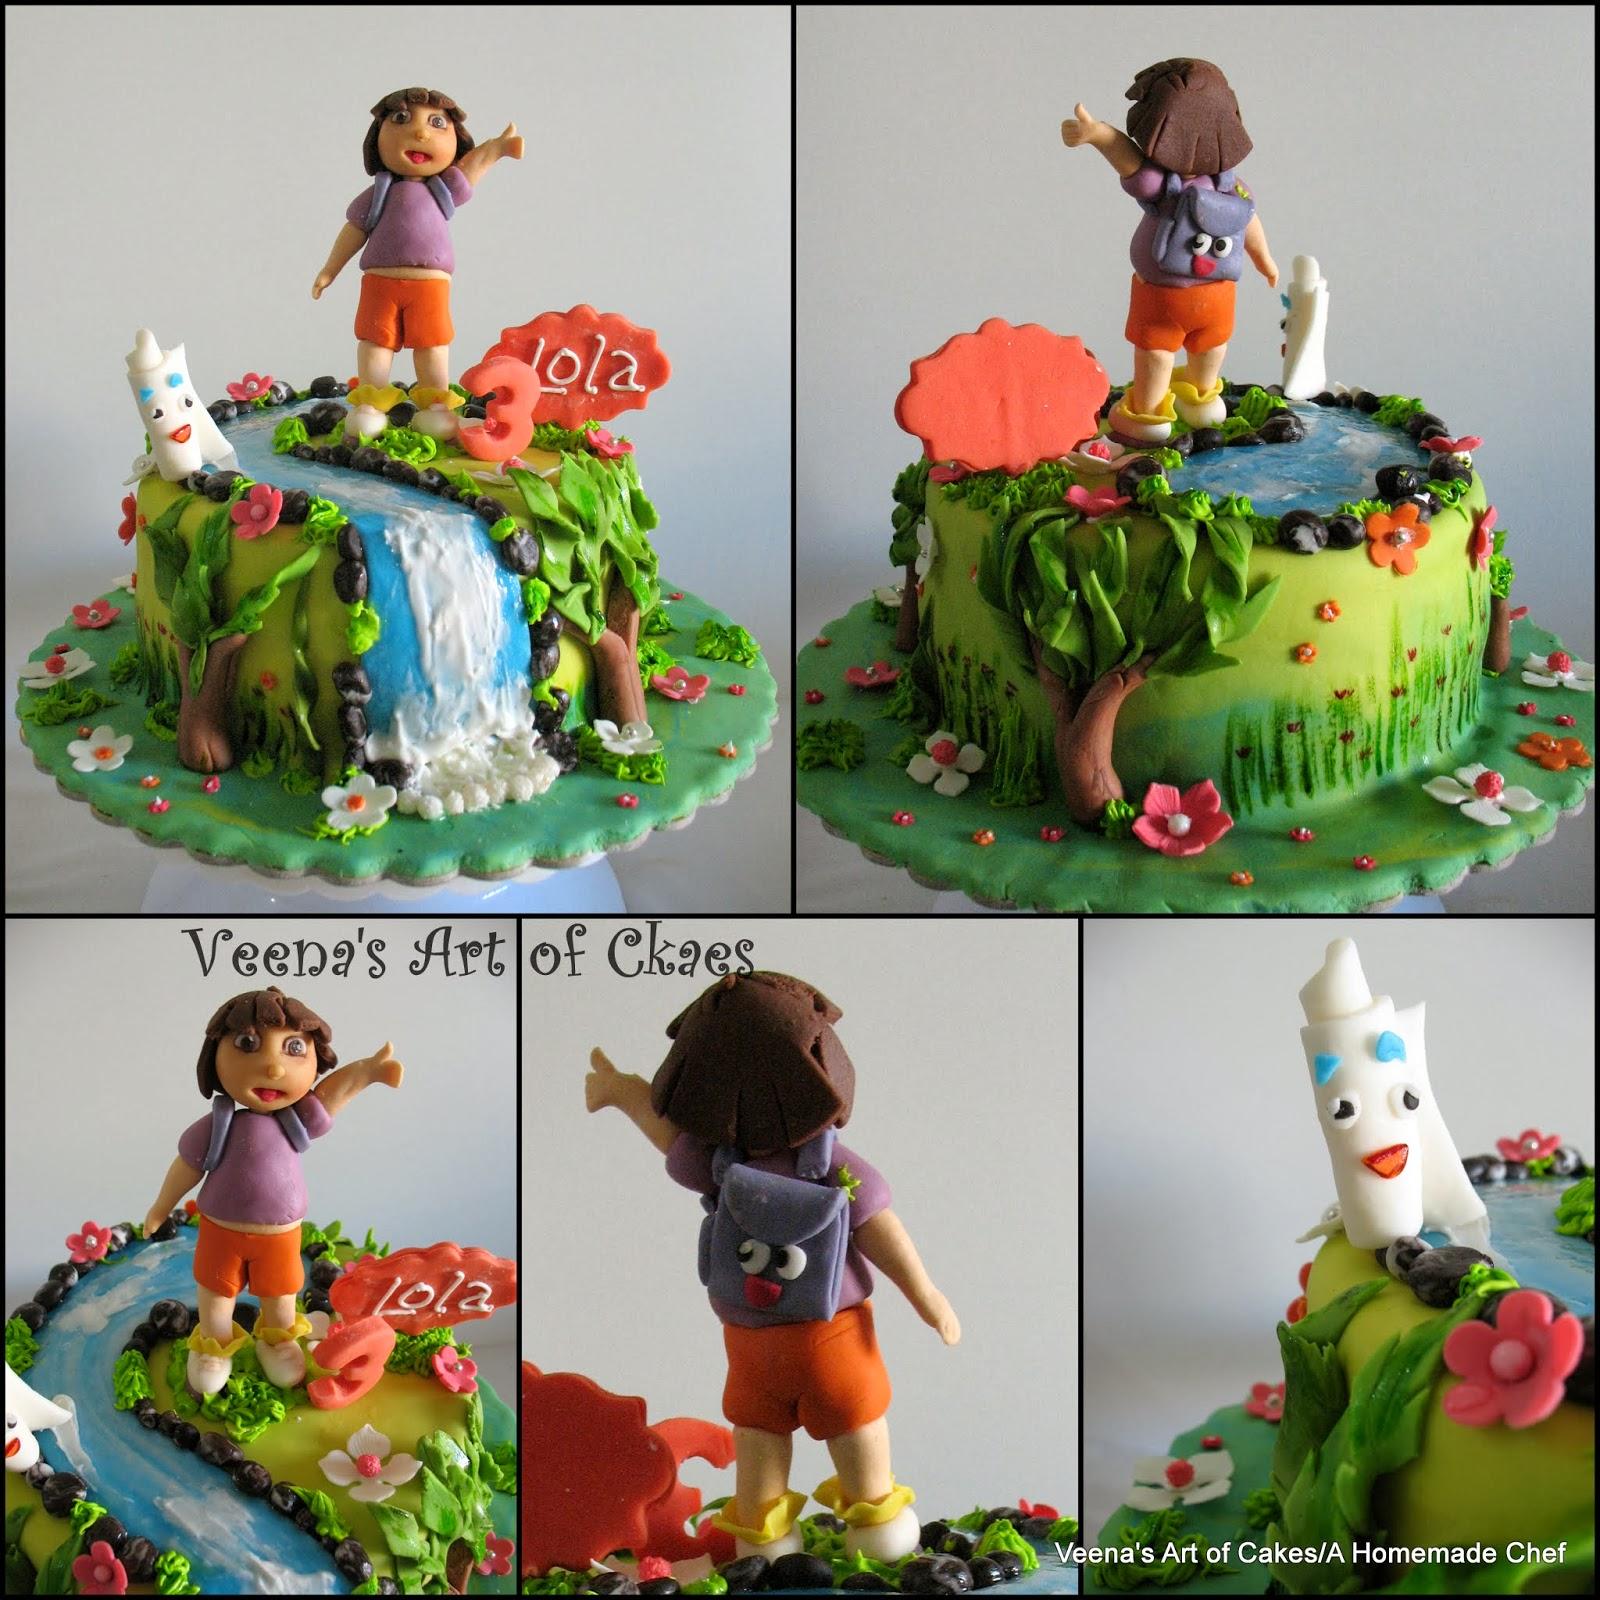 Veena Art Of Cake Fondant Recipe : Veena s Art of Cakes: Dora The Explorer Cake with How to ...